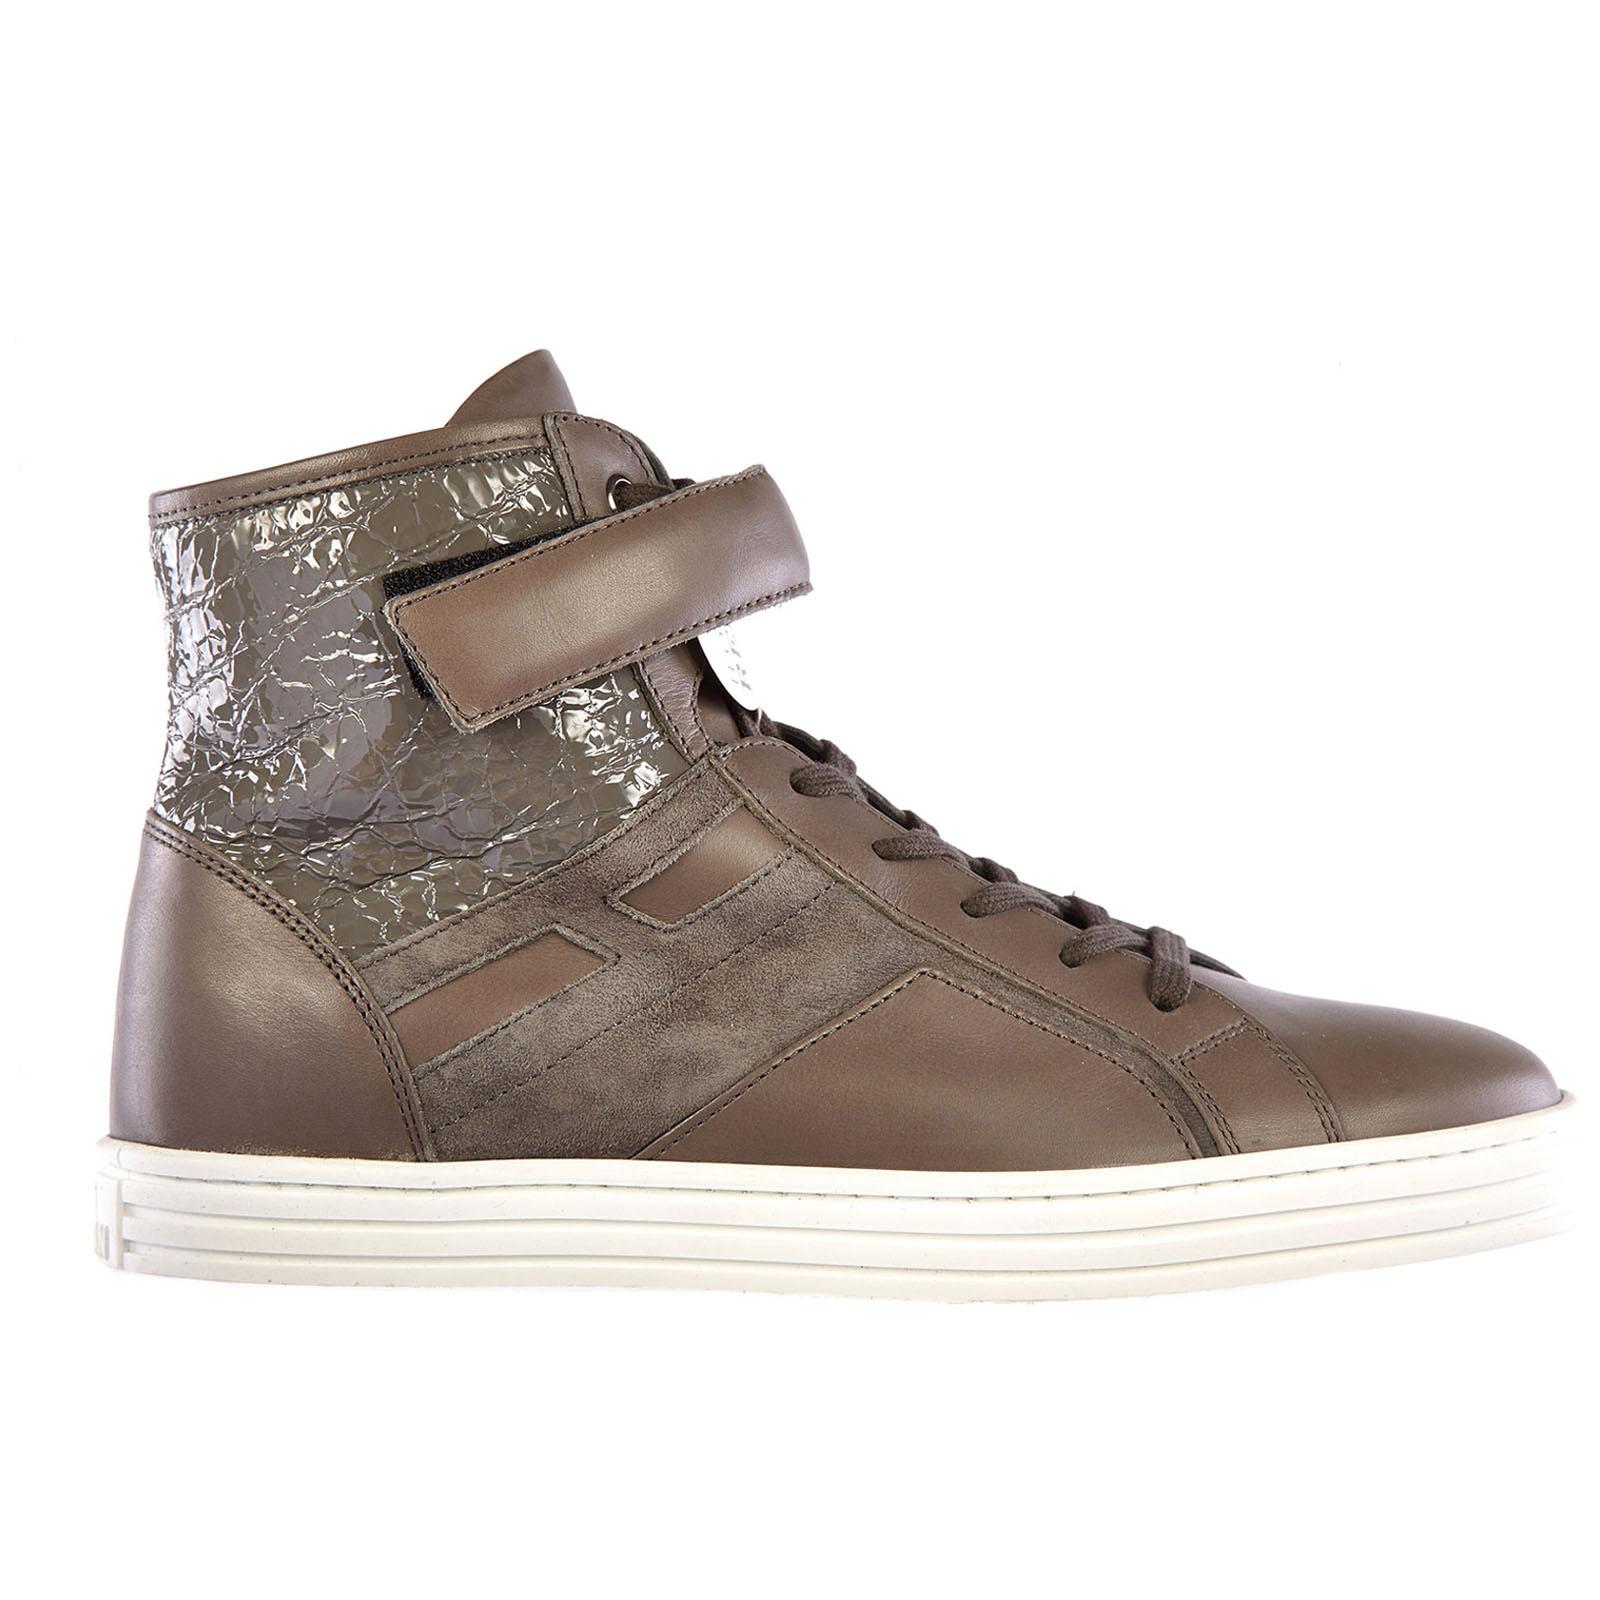 Scarpe sneakers alte donna in pelle rebel r182